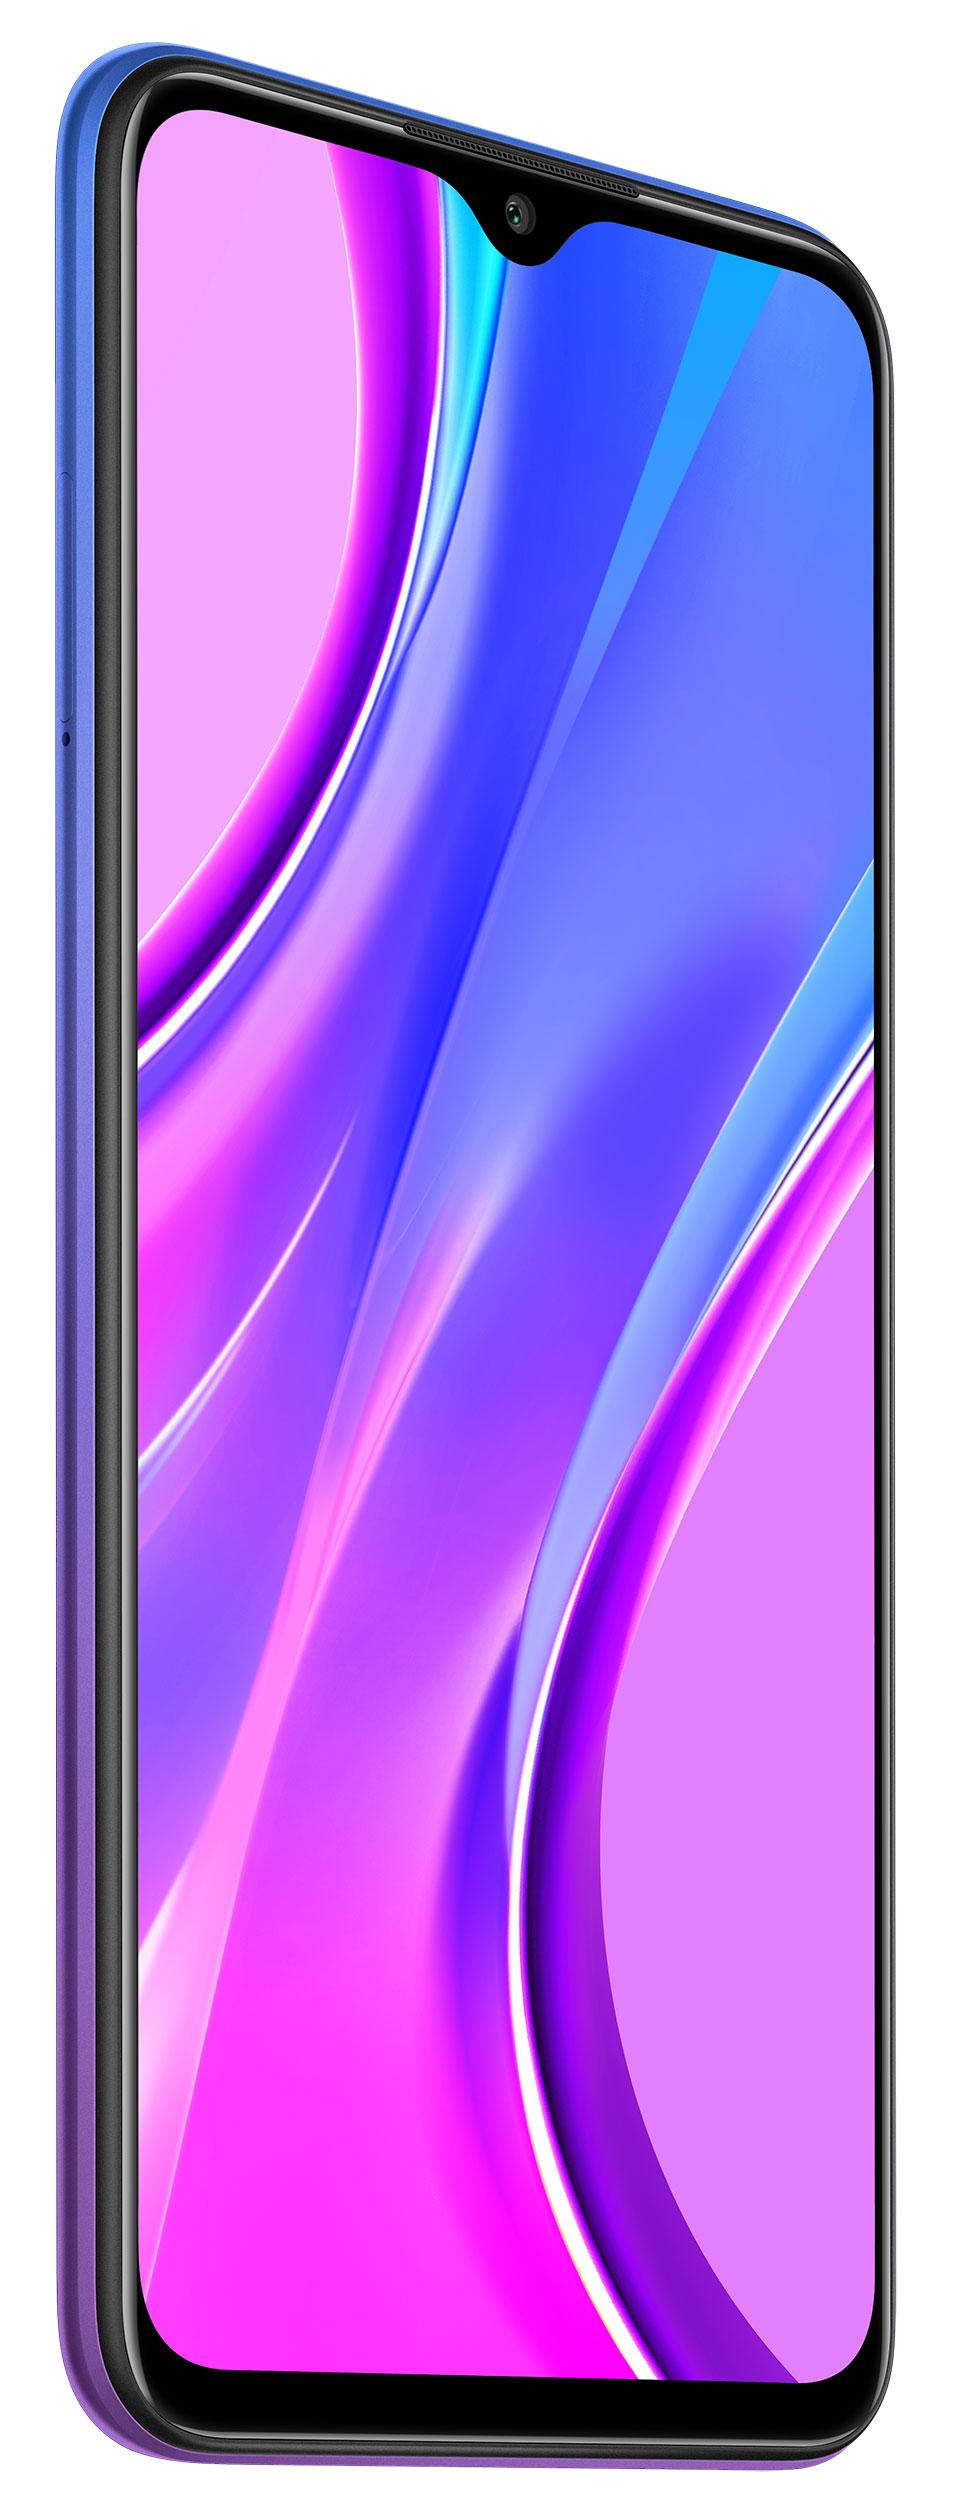 Smartphone Redmi 9 - Global - 4+64 - Violet